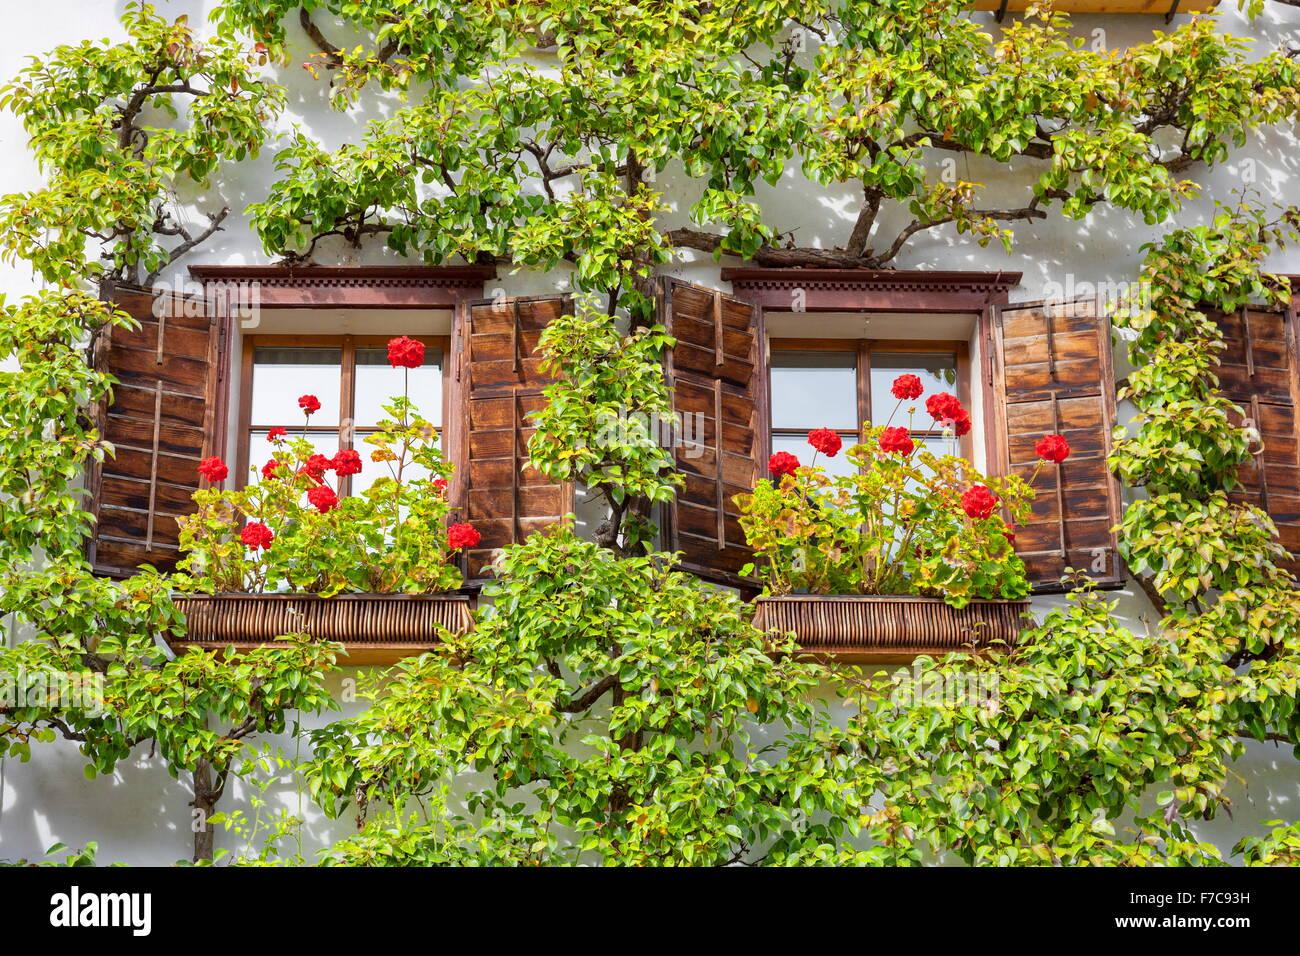 Ventanas con flores, Hallstatt, Salzkammergut, Austria Imagen De Stock